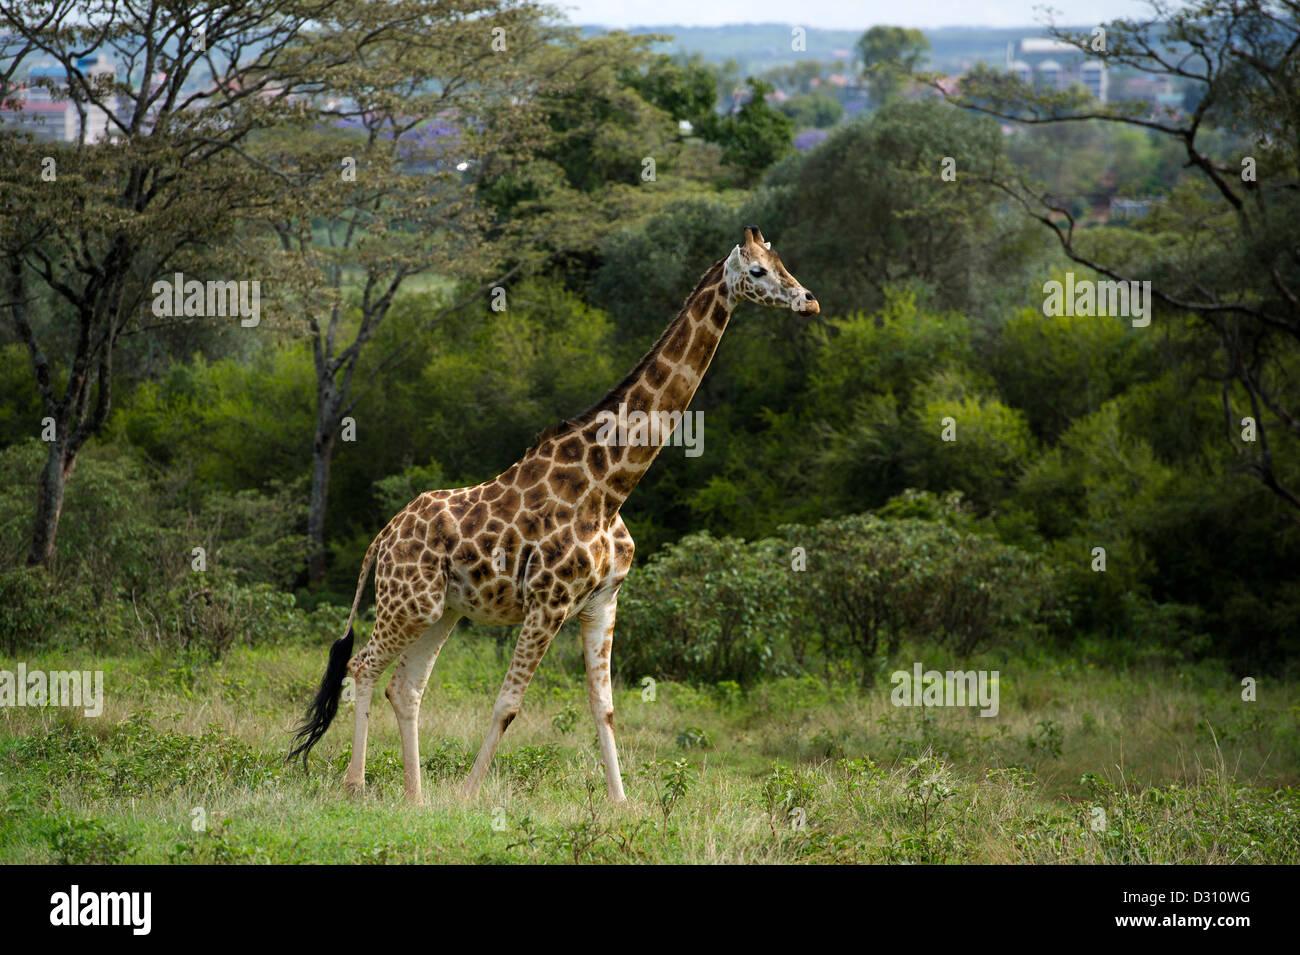 Rothschild Giraffe (Giraffa camelopardalis rothschildi), AFEW Giraffe Centre, Nairobi, Kenya - Stock Image